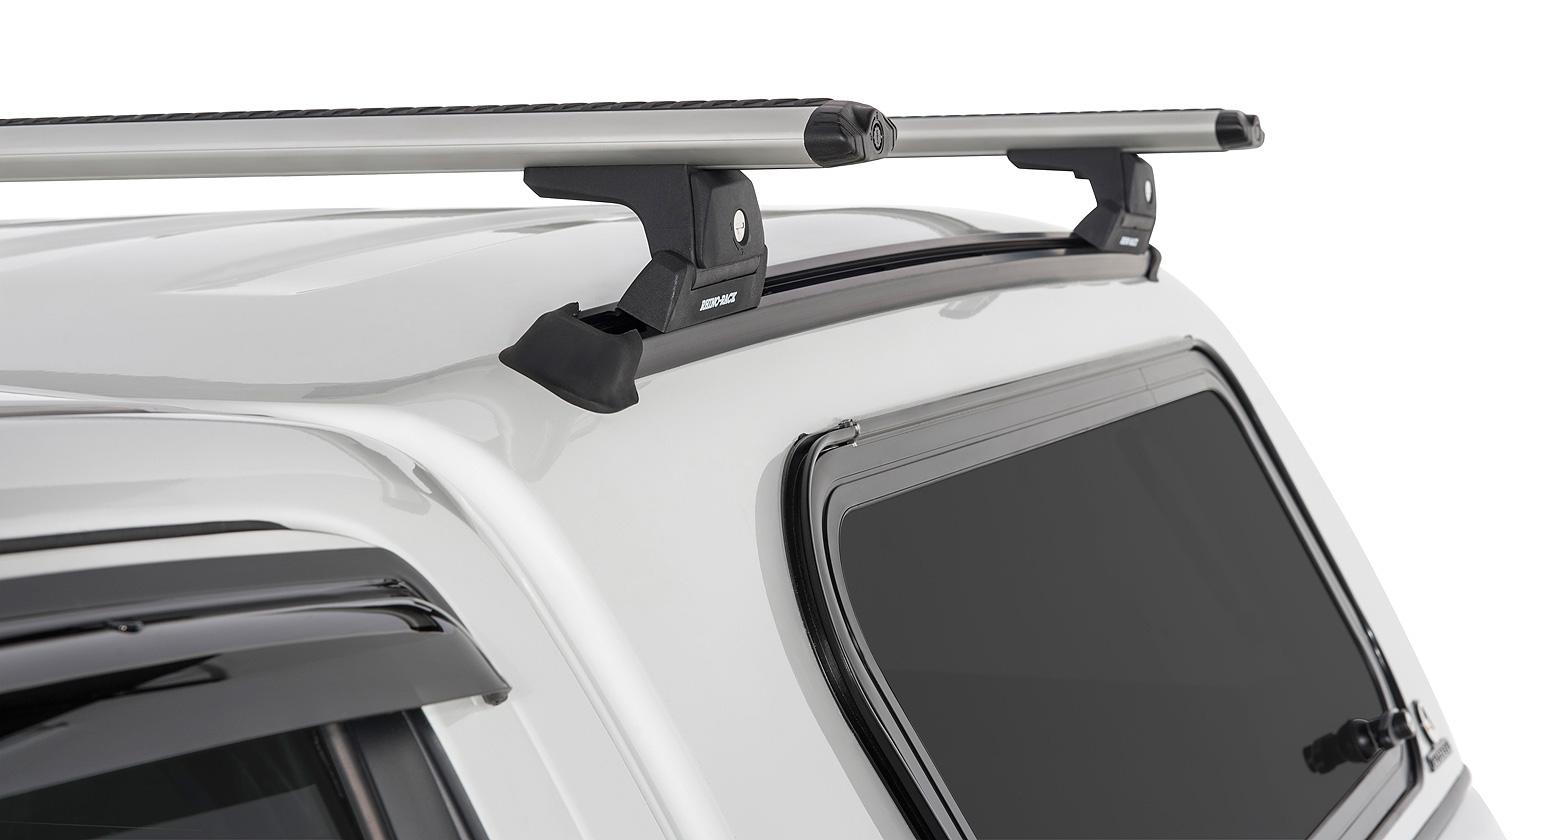 Ja6377 Vortex Rlt600 Trackmount Silver 2 Bar Canopy